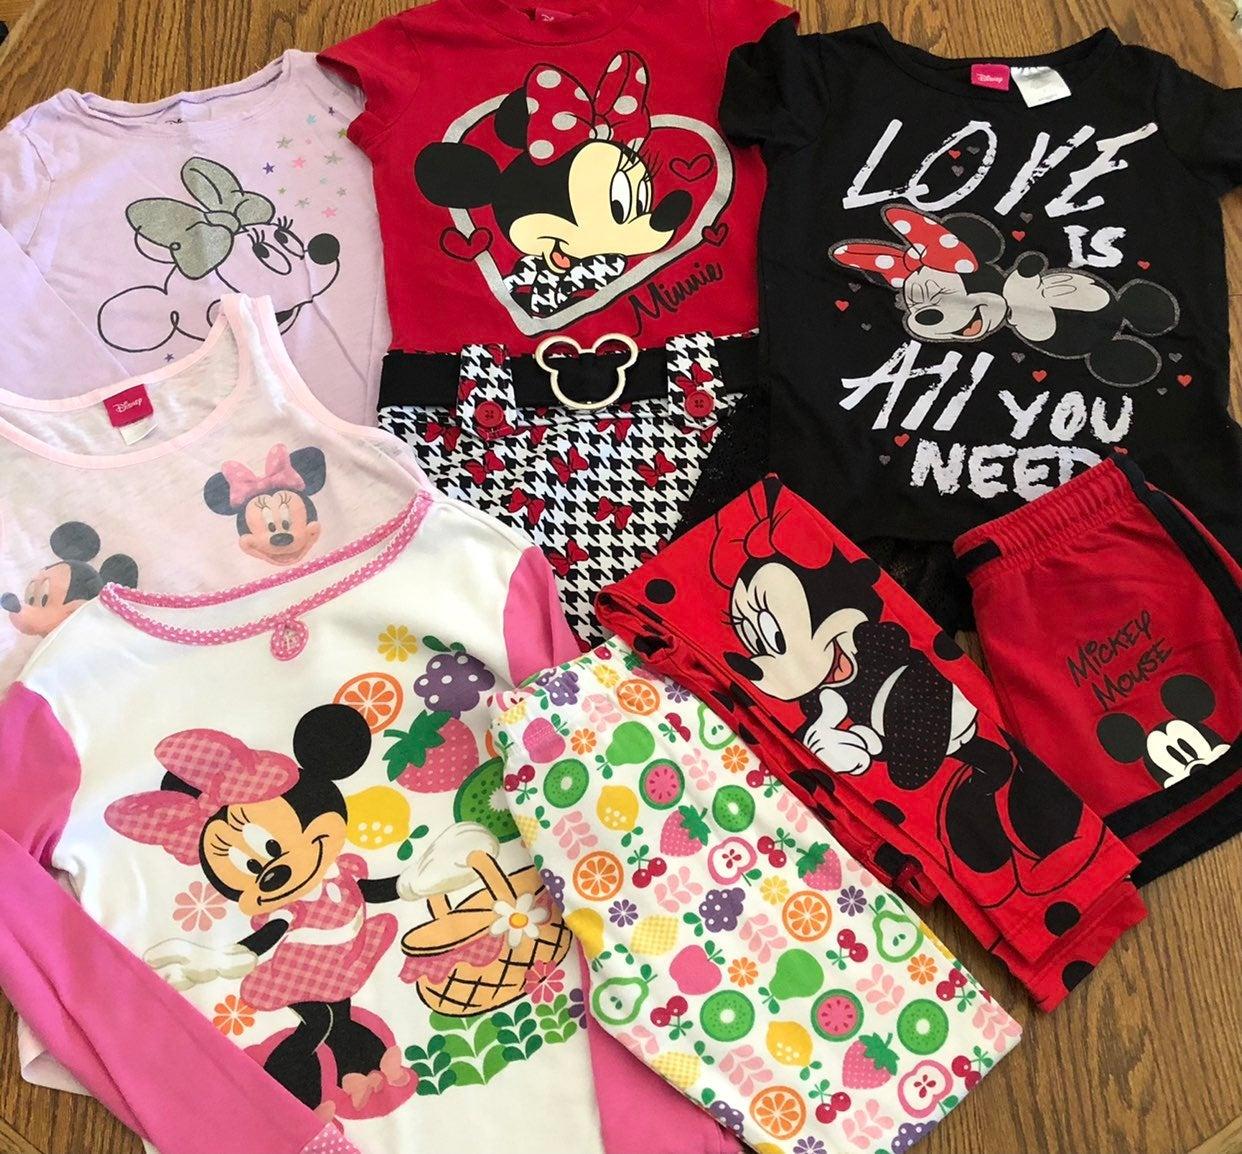 Disney Minnie Mouse Girls 6 7 Shirts Pjs